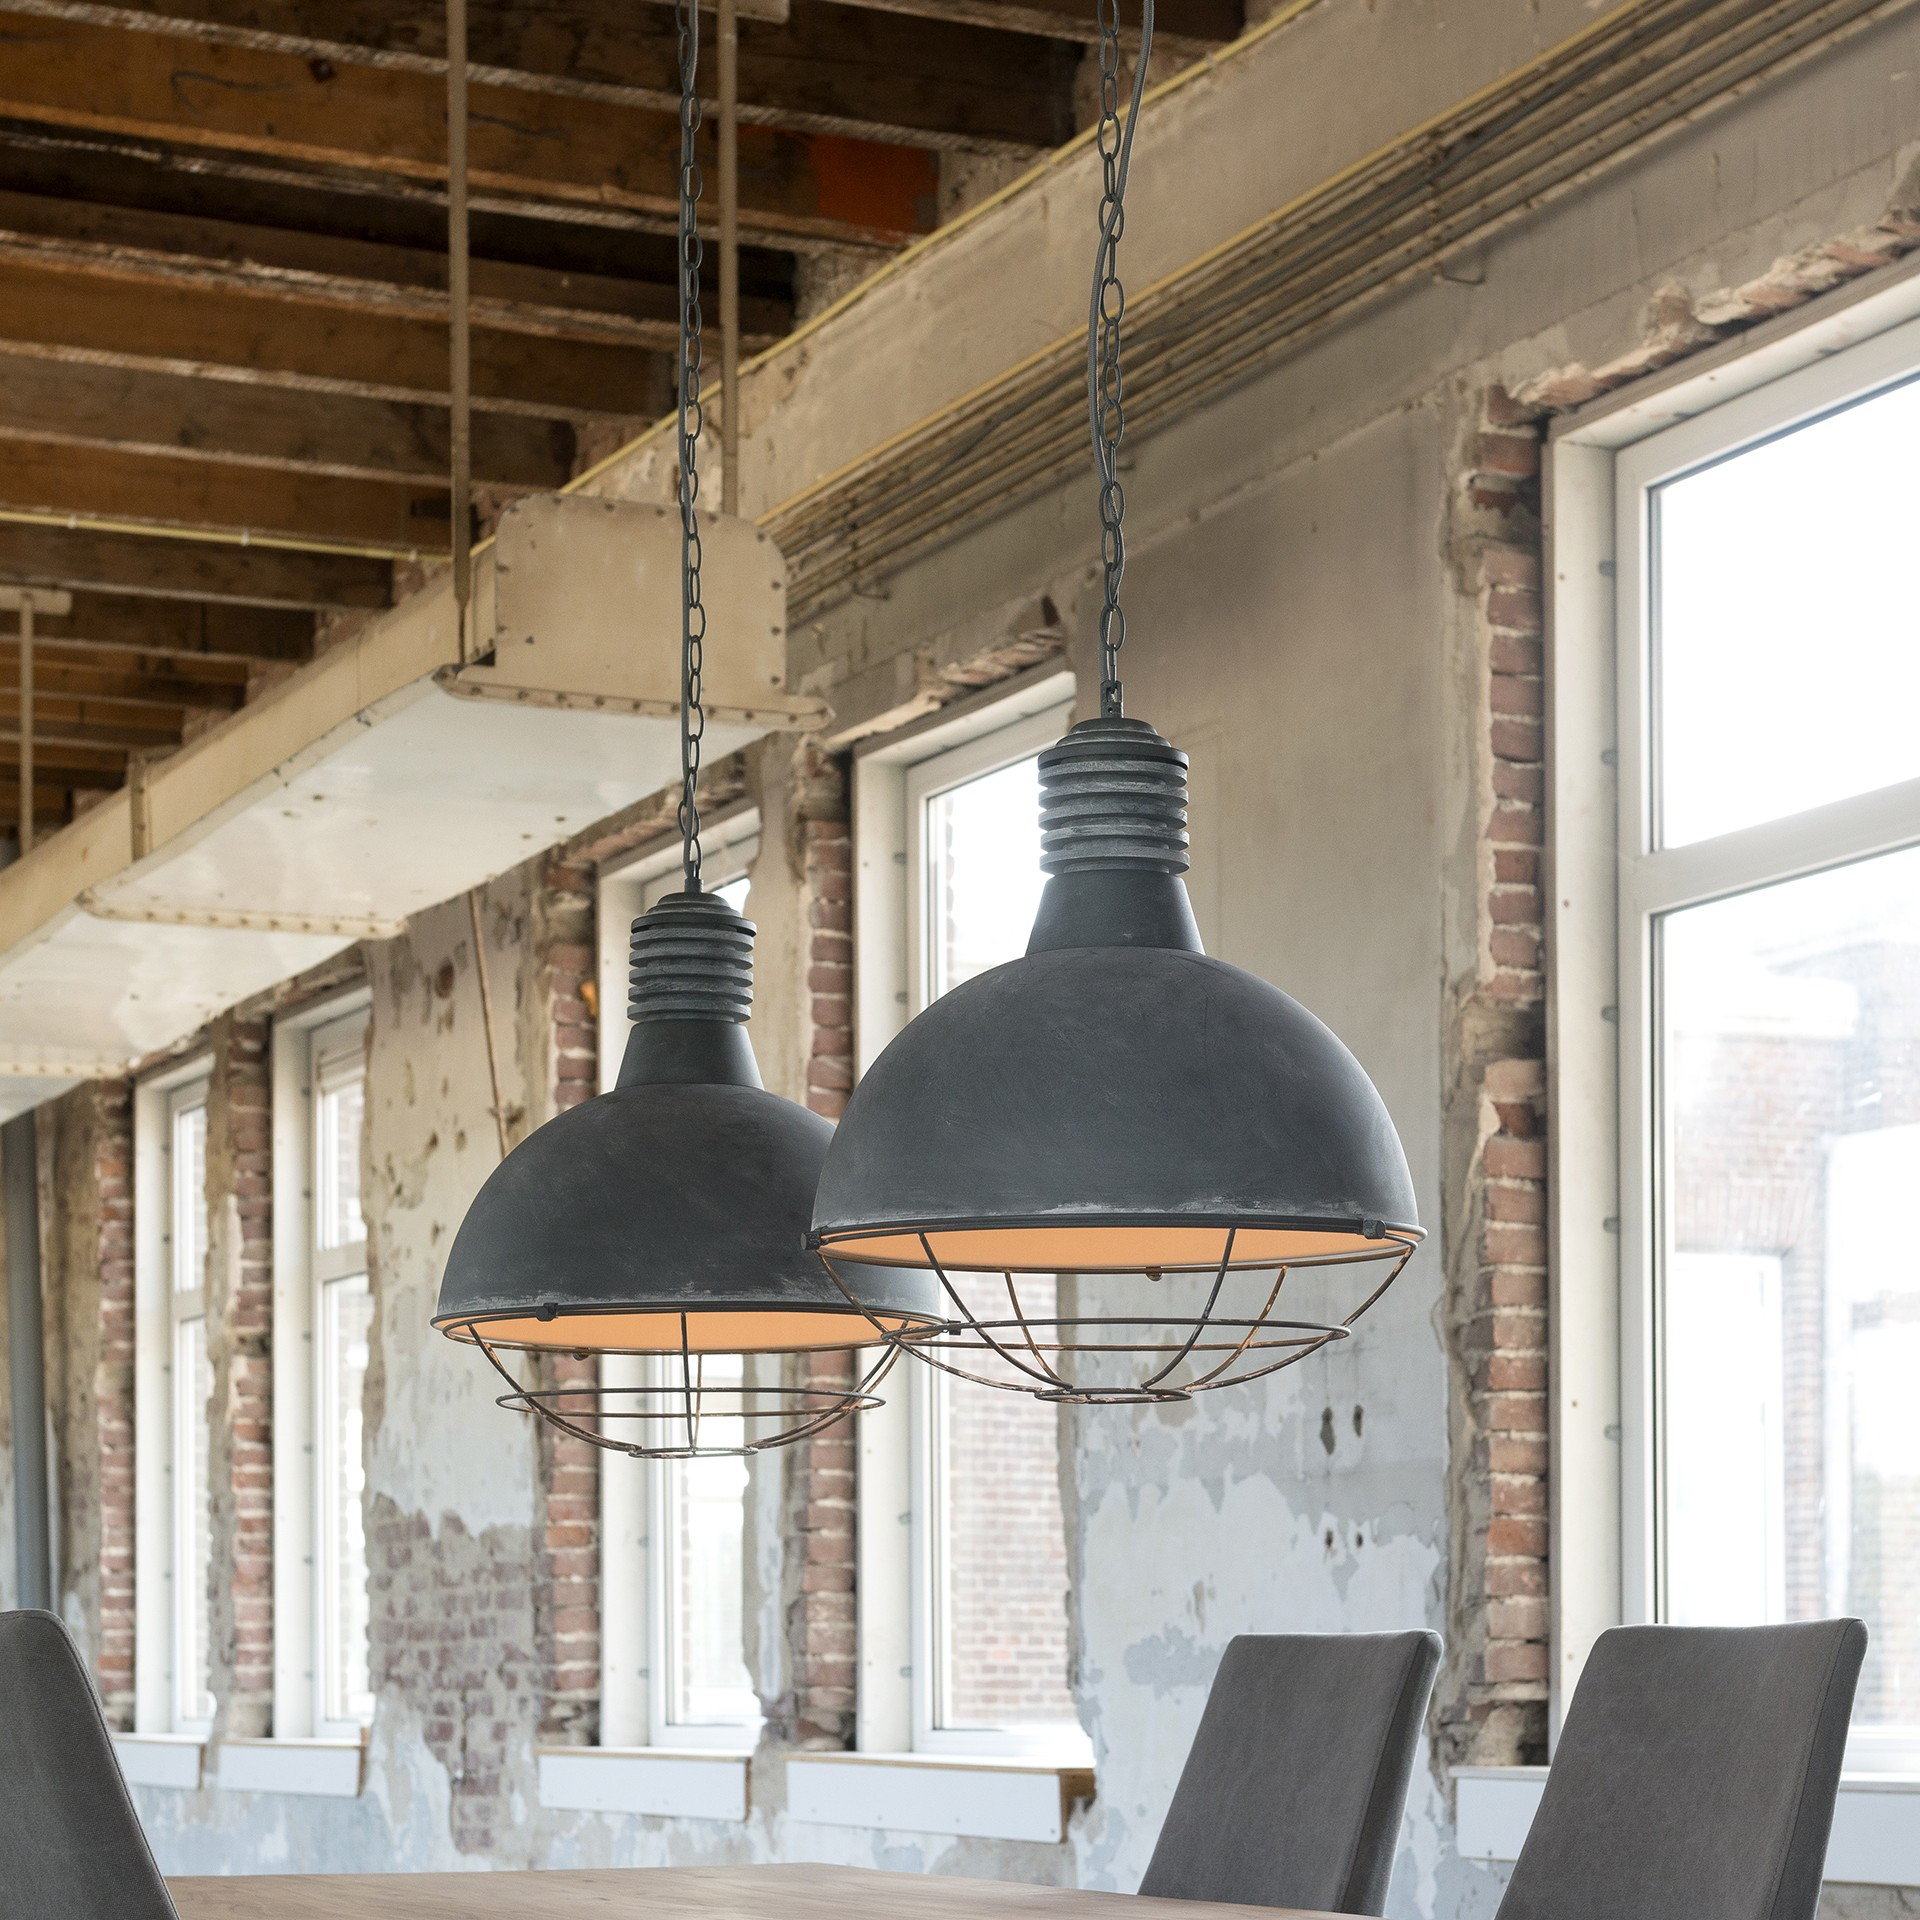 Pendelleuchte grau Metall,  Industrie Lampe grau, Hängelampe grau, Durchmesser 41 cm